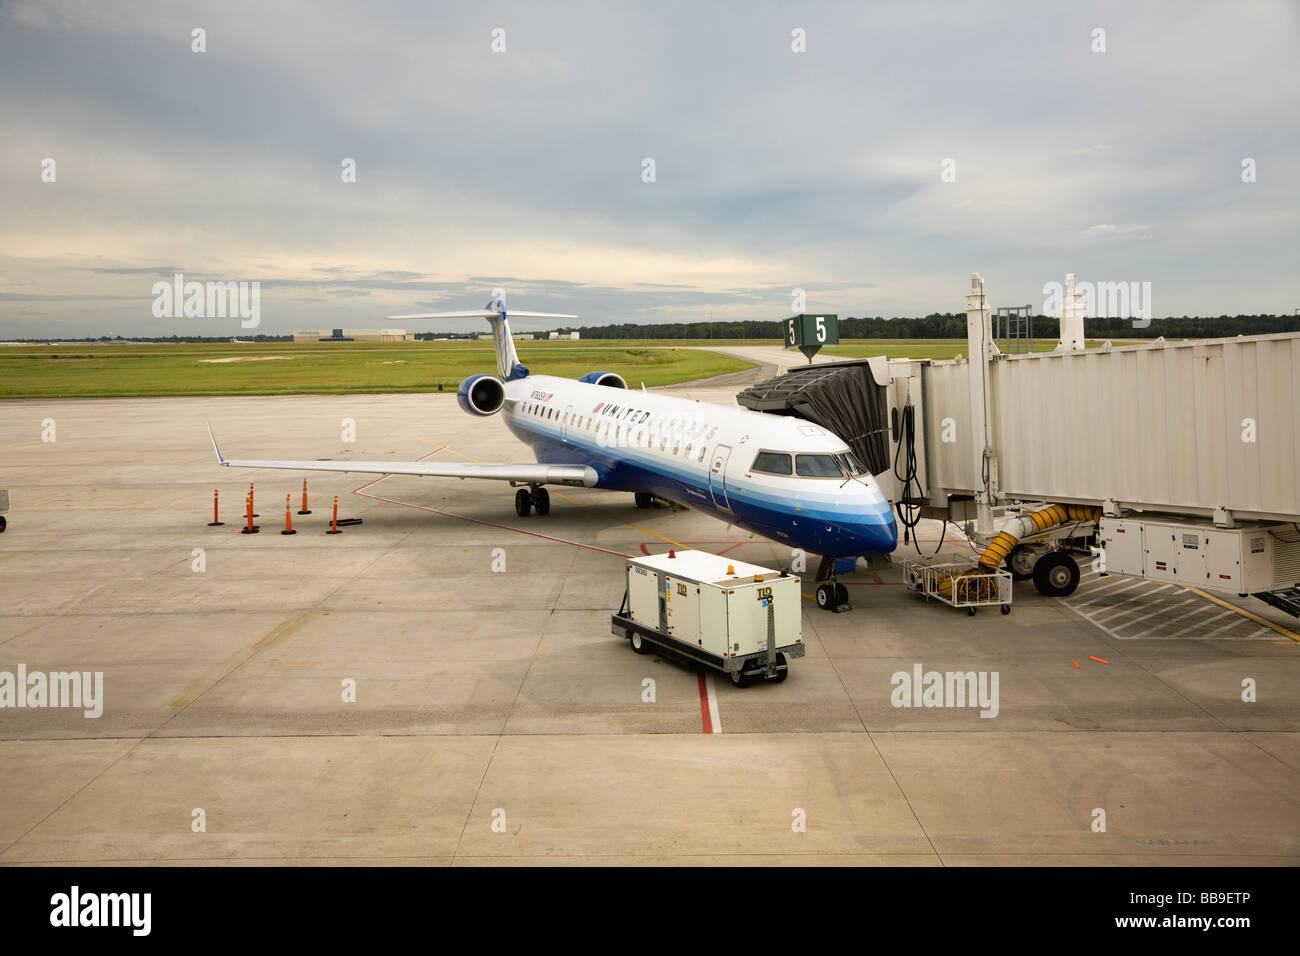 United Express Bombardier Canadair Regional Jet CRJ701 at Savannah Hilton Head Airport, Georgia, USA - Stock Image